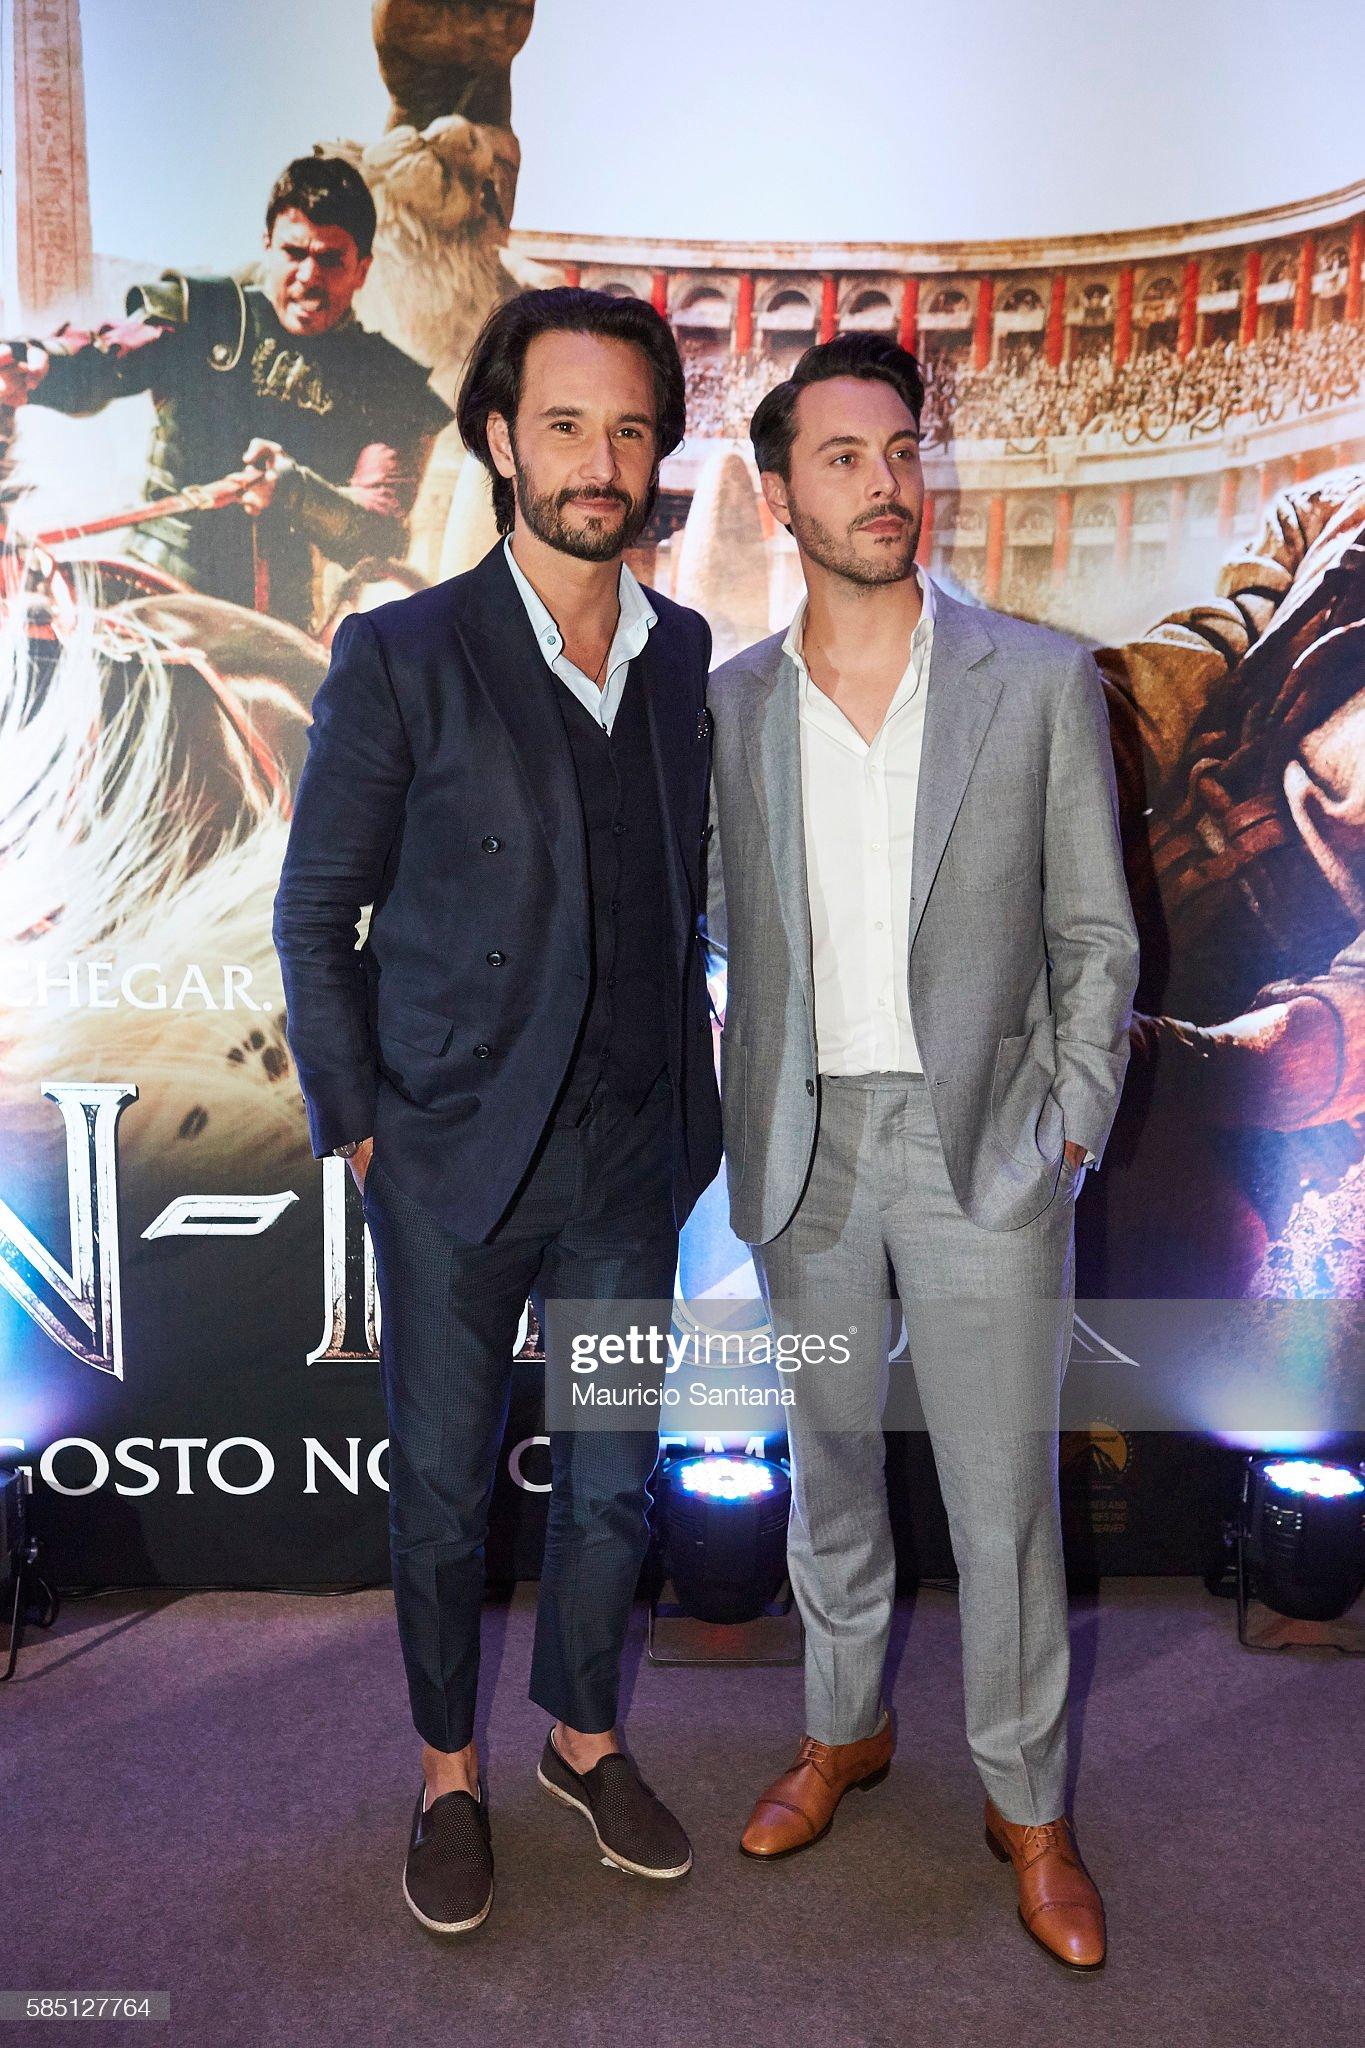 ¿Cuánto mide Rodrigo Santoro? - Altura - Real height Rodrigo-santoro-and-jack-huston-attend-the-brazil-premiere-of-the-picture-id585127764?s=2048x2048